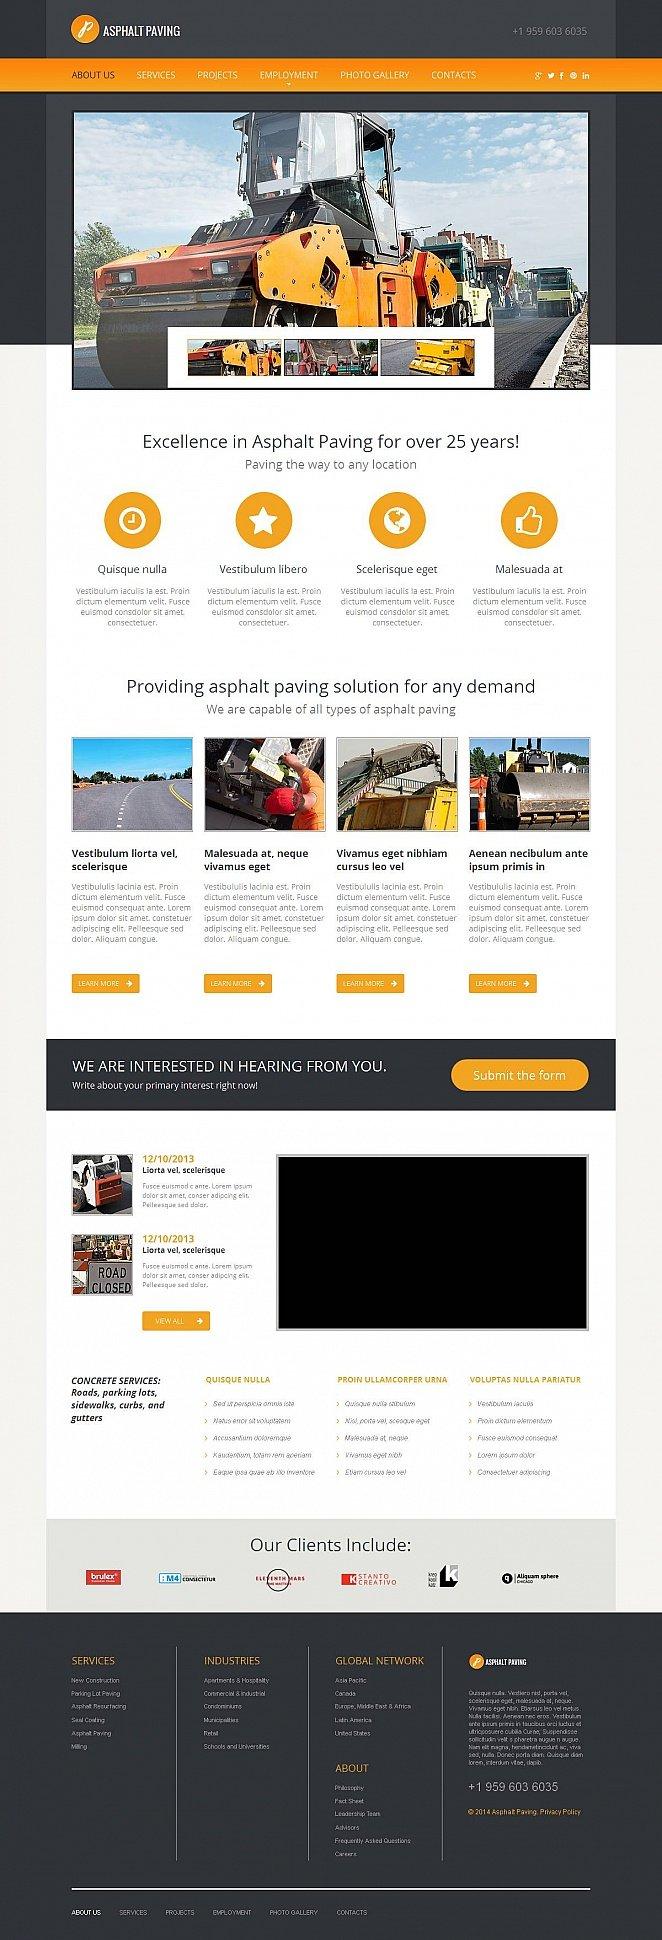 CMS Website Template for Asphalt Paving Services - image